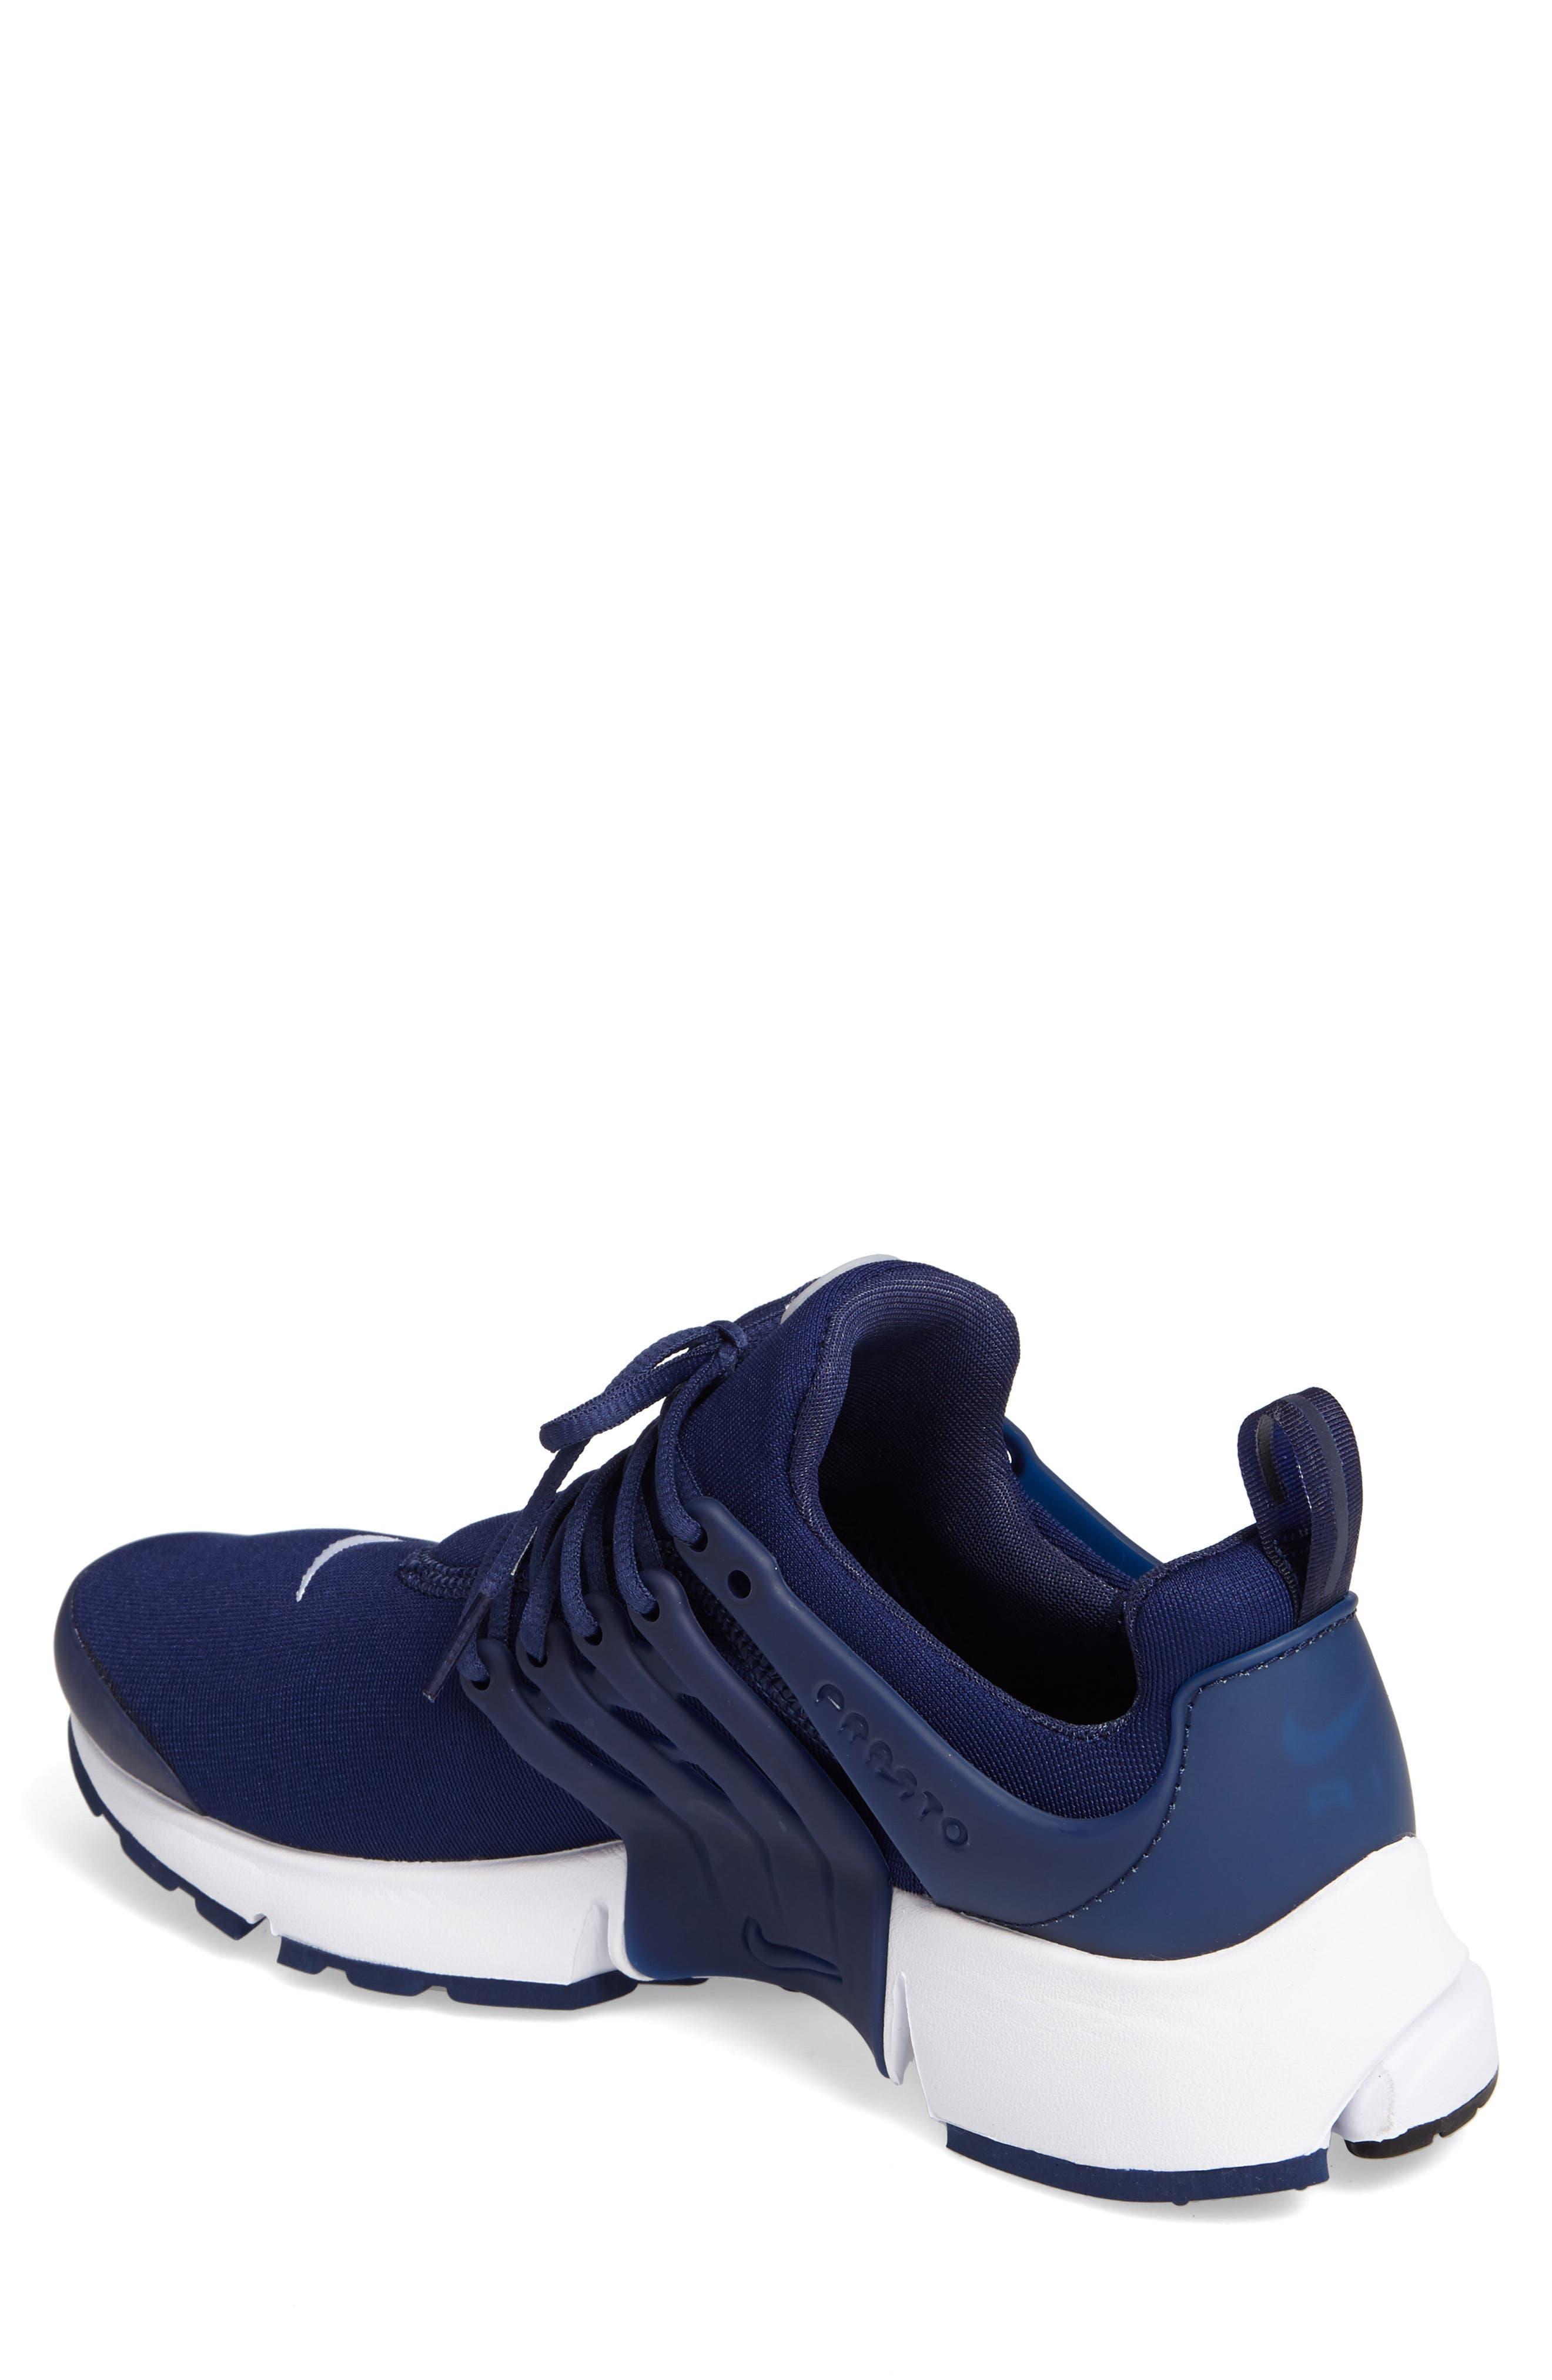 Air Presto Essential Sneaker,                             Alternate thumbnail 29, color,